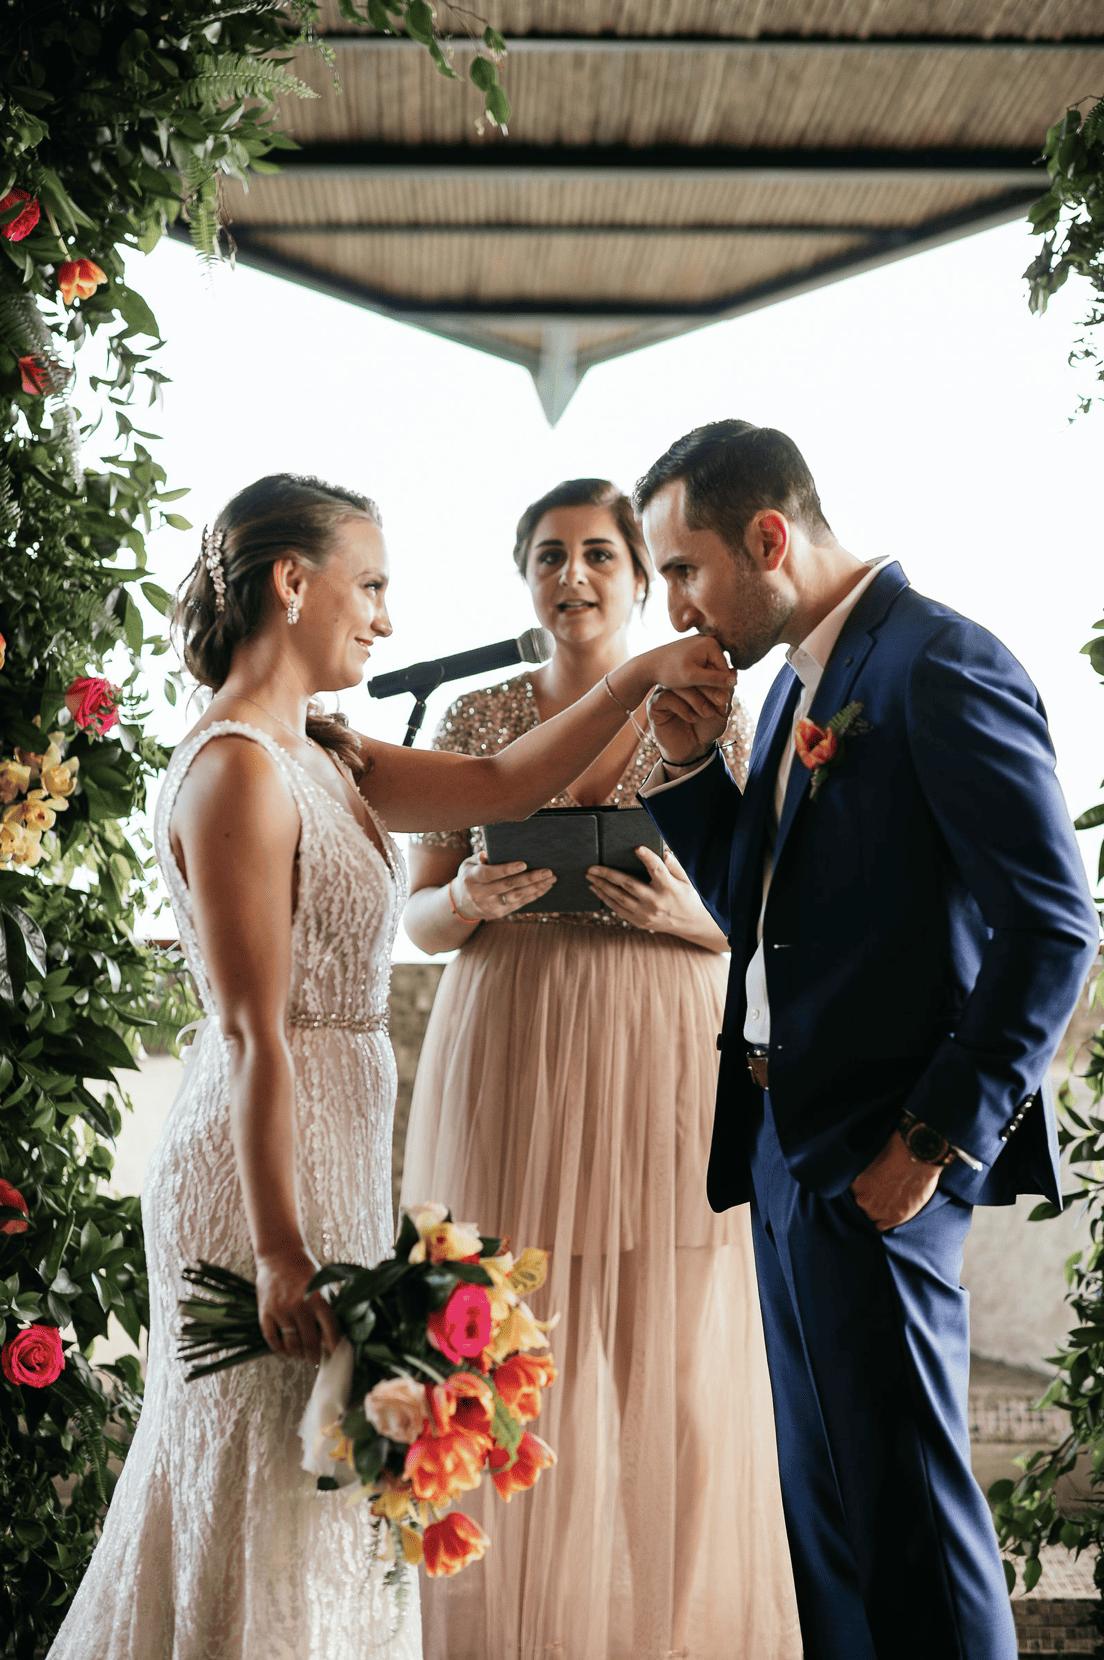 Anna & Michael Real Wedding At Villa Punto de Vista (Susan La Rue Events)